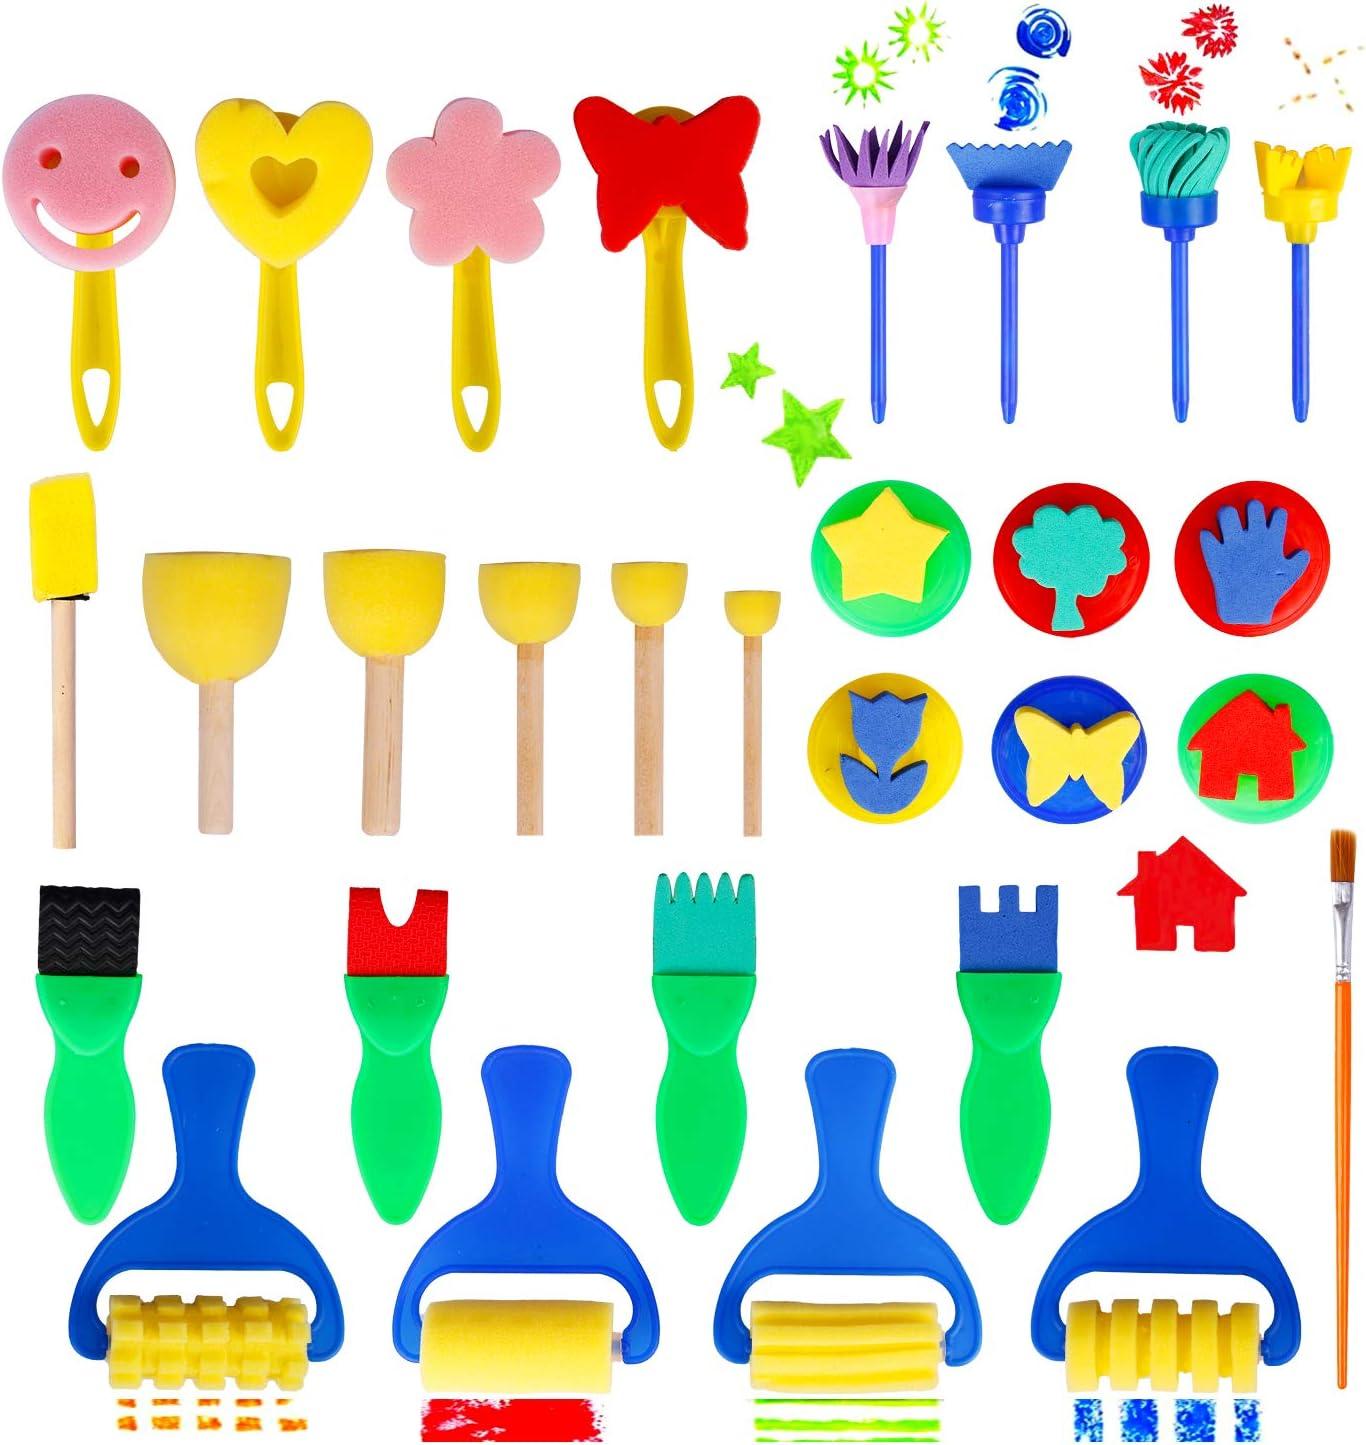 10Pcs//set Children/'s Finger Painting Graffiti sponge Painting Art Tools Gifts